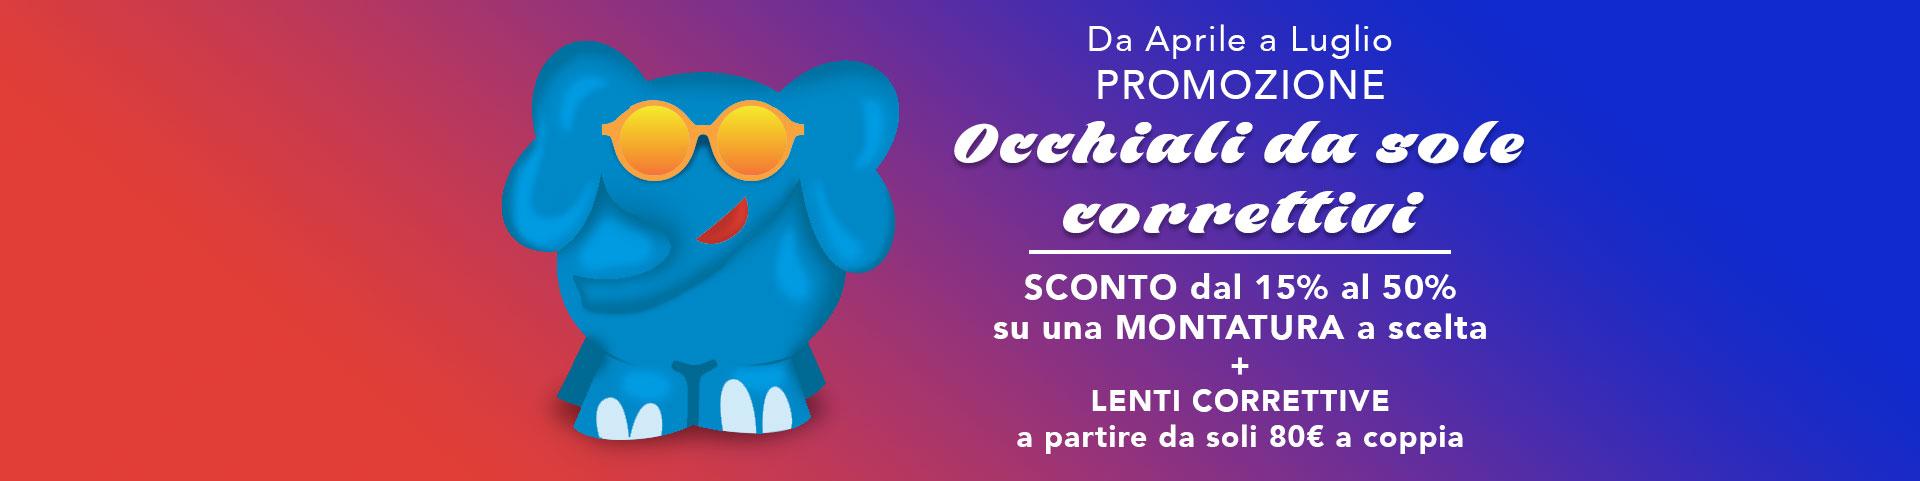 slide-sito-promo-occhiali-2018-ok